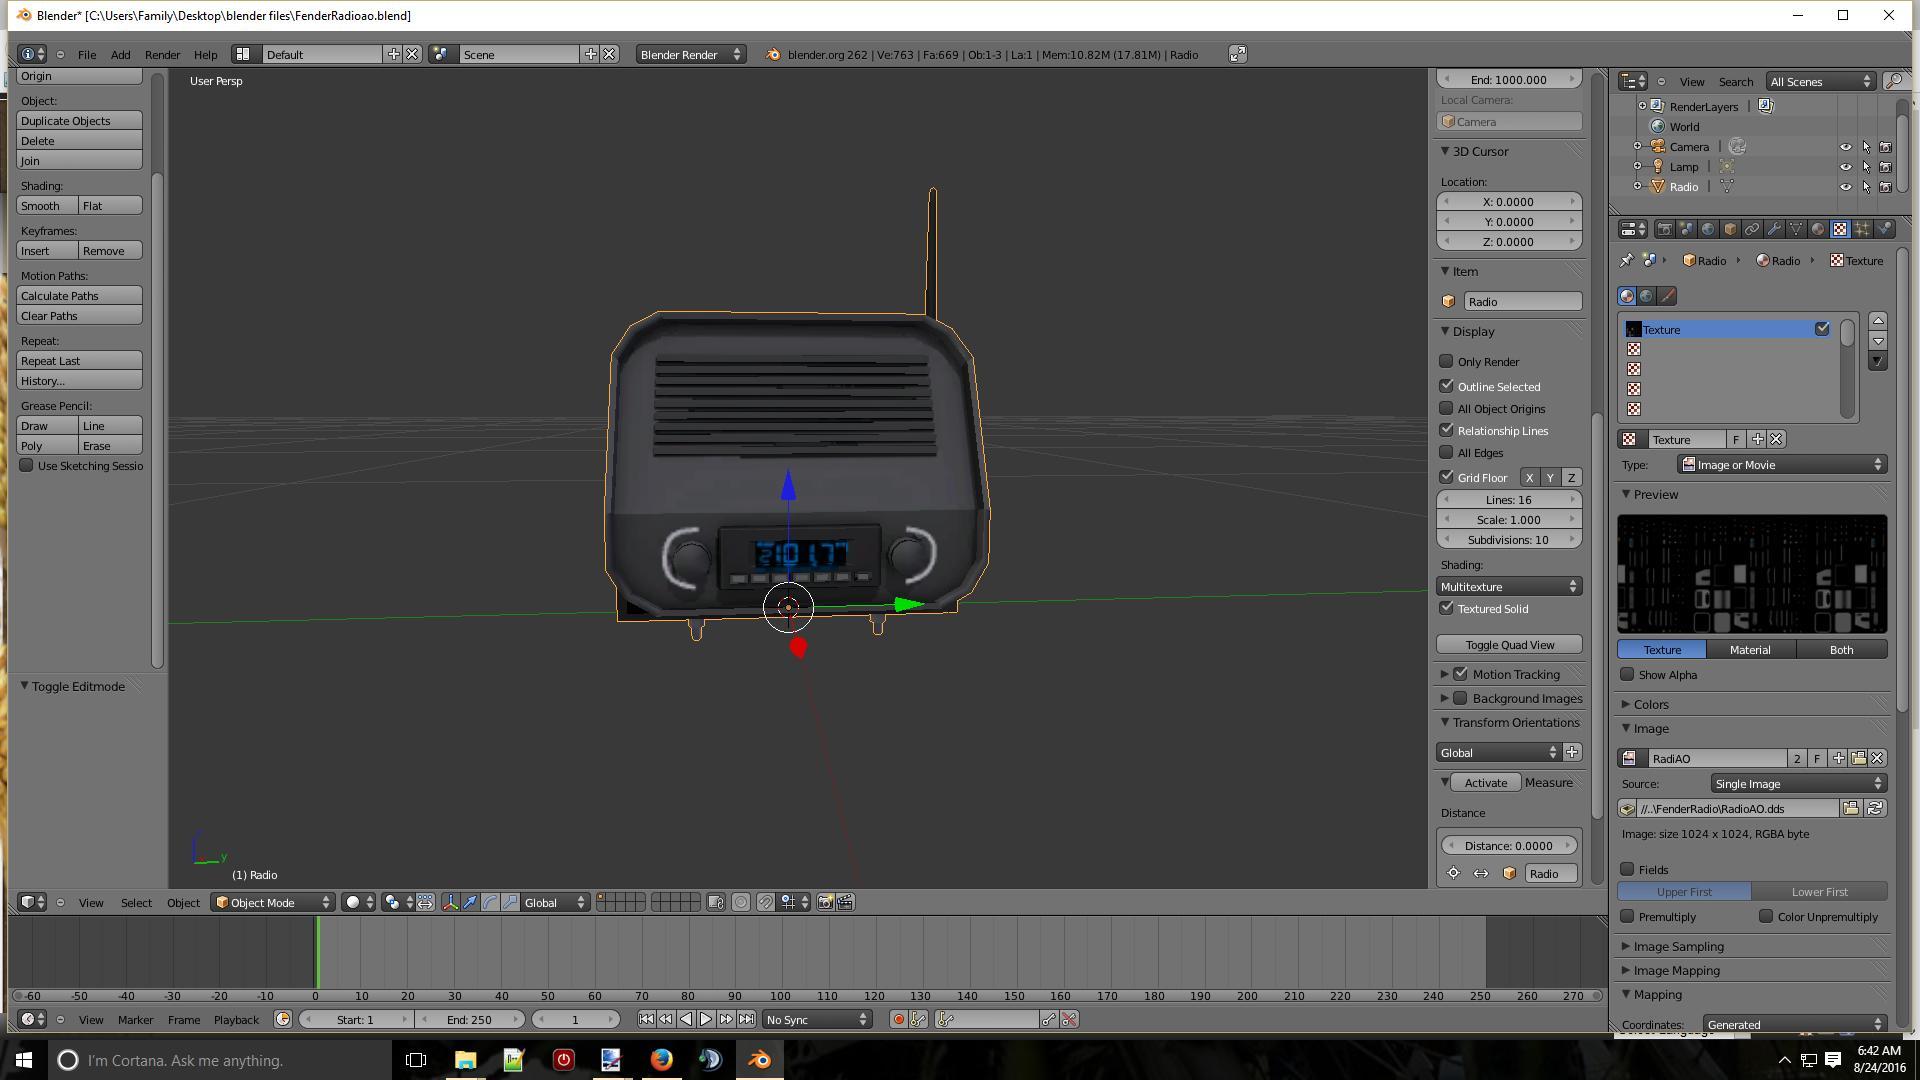 FENDER RADIO BETA LS15 - Farming simulator 2019 / 2017